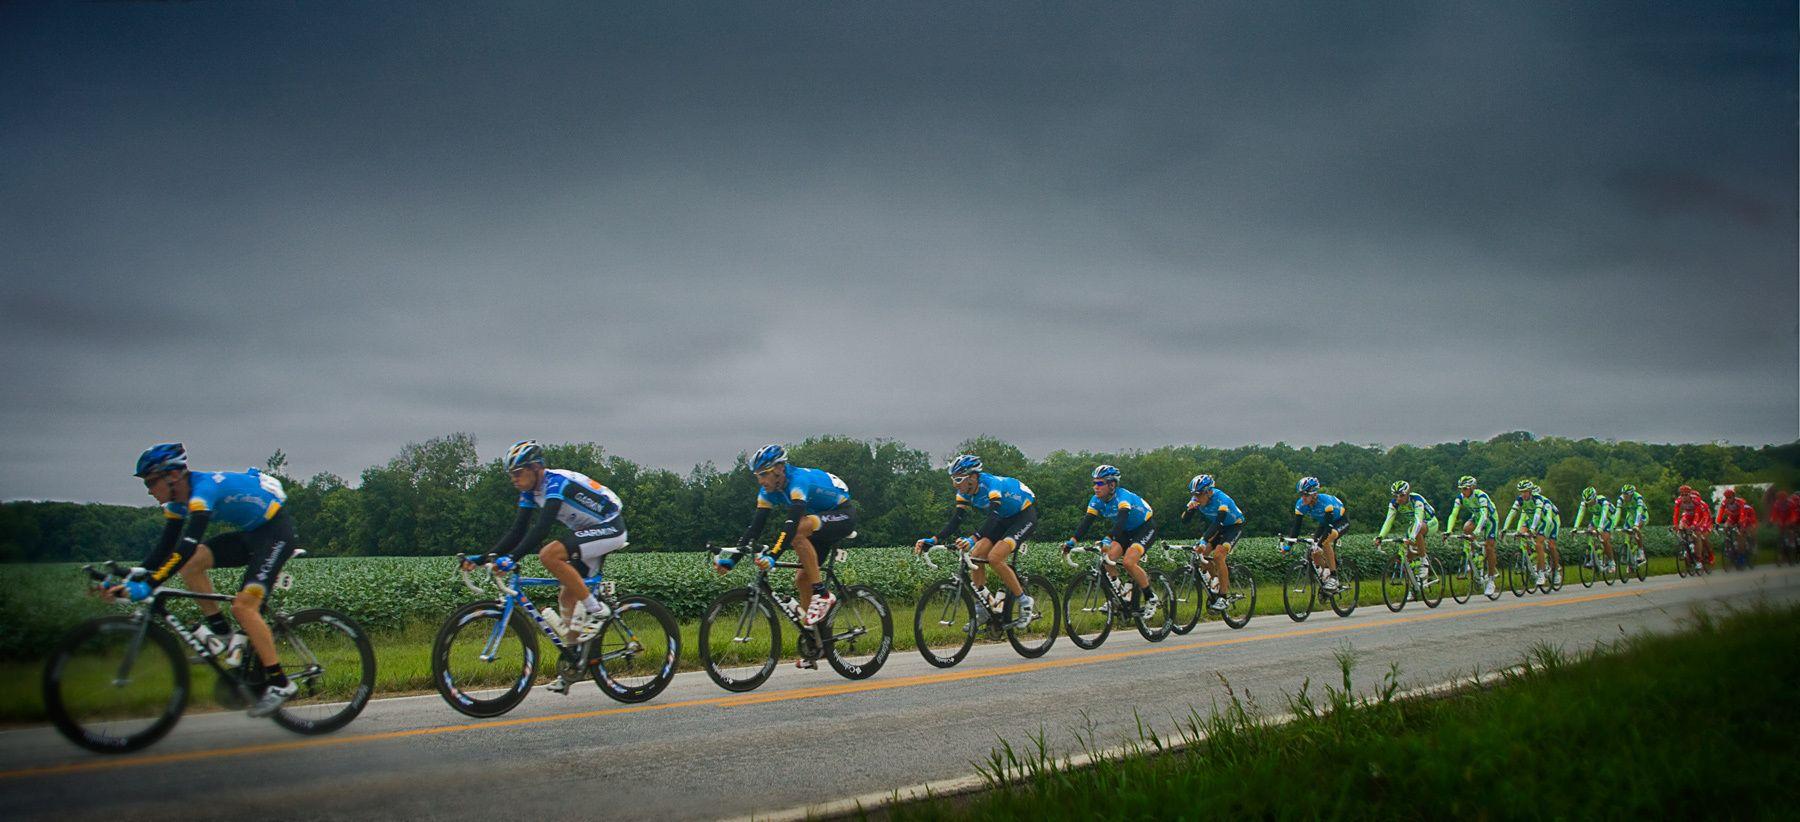 1cyclists.jpg